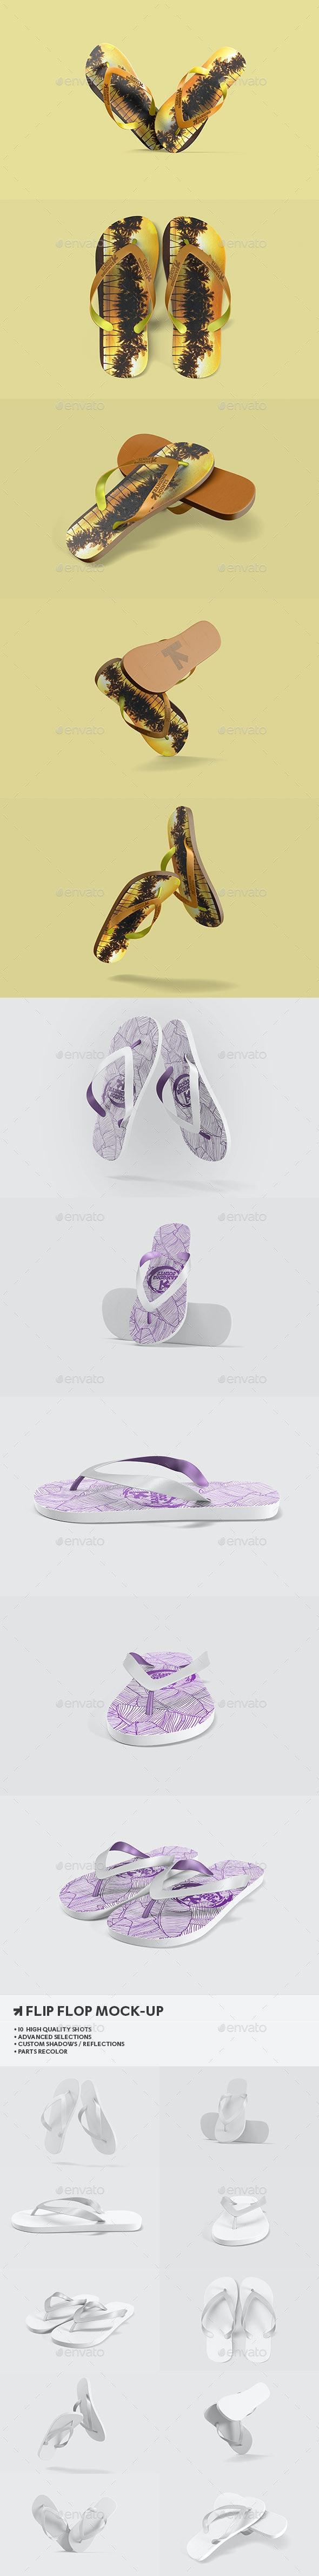 Flip Flops / Sandals Mock-Up - Miscellaneous Apparel